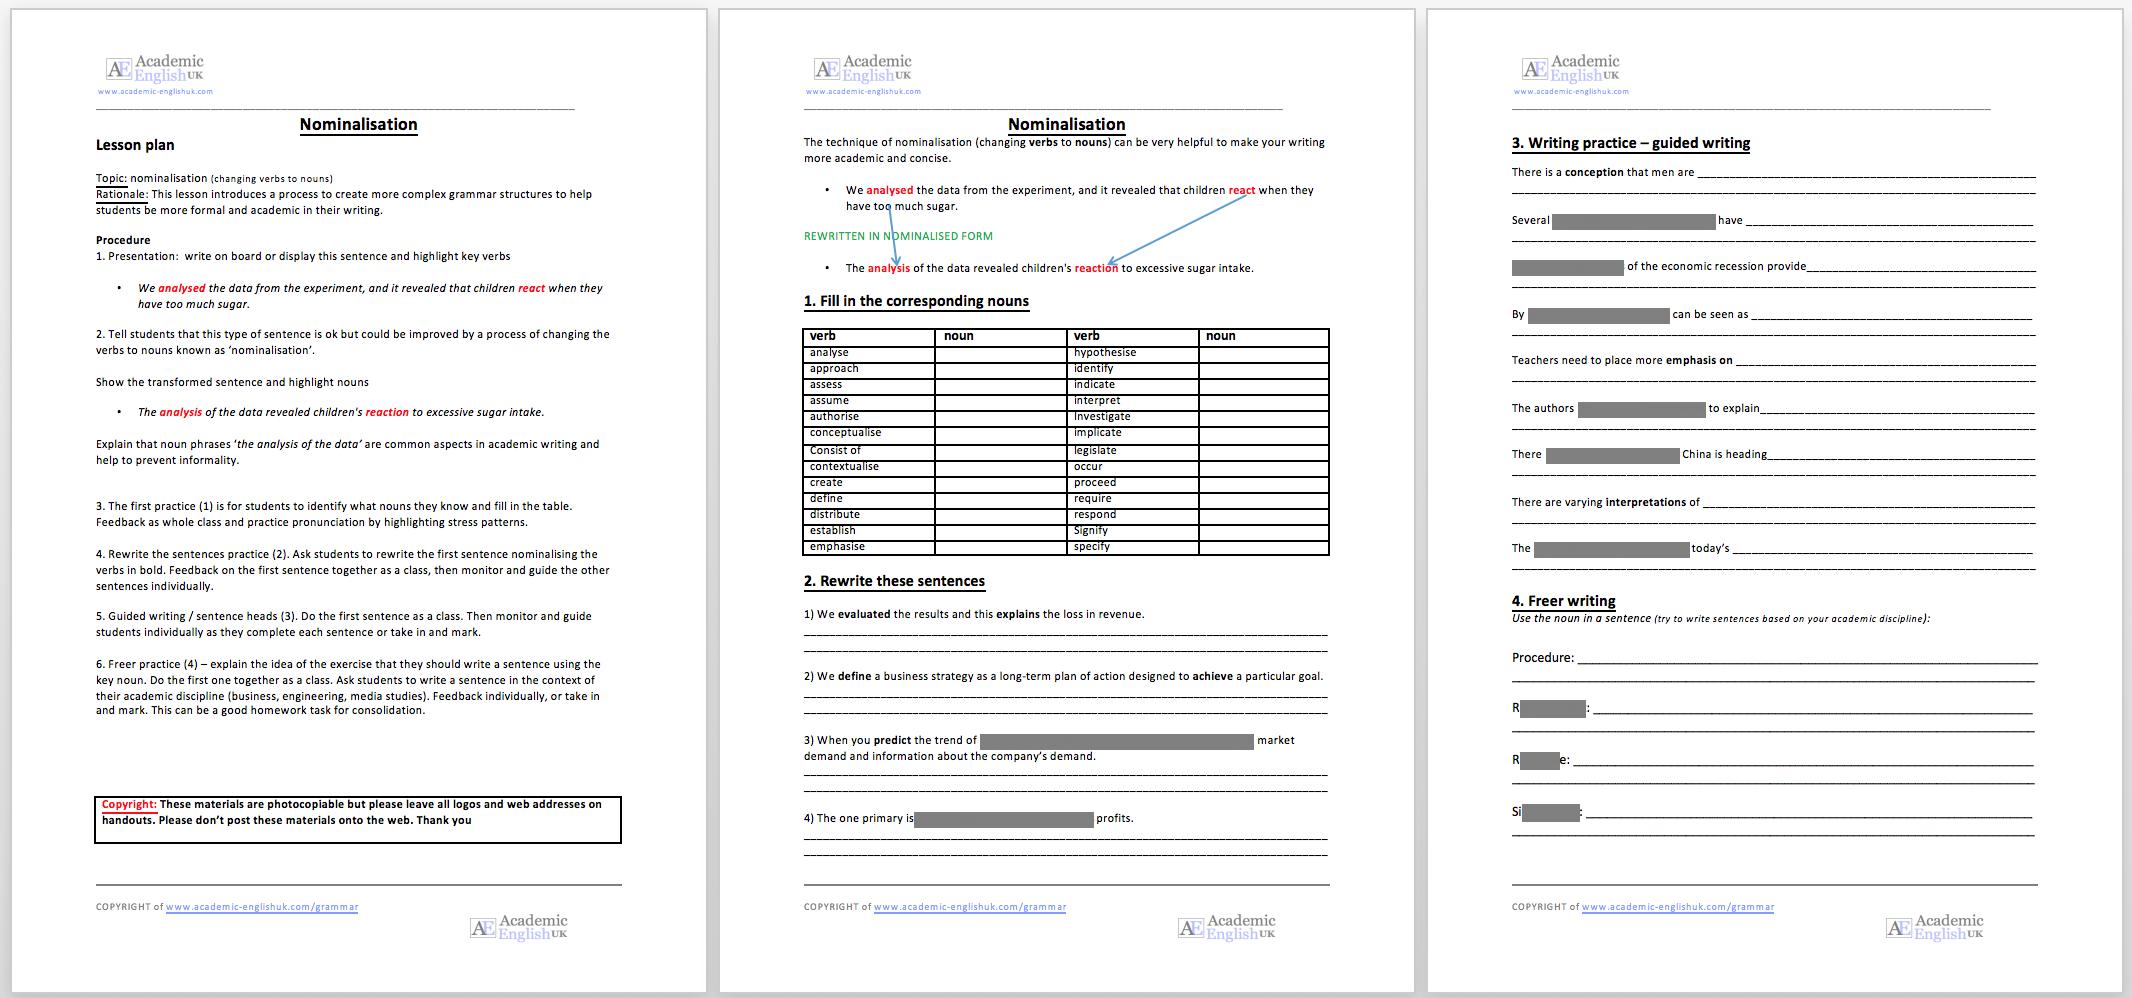 Teaching Hedging for ESL Writing (Worksheet included)